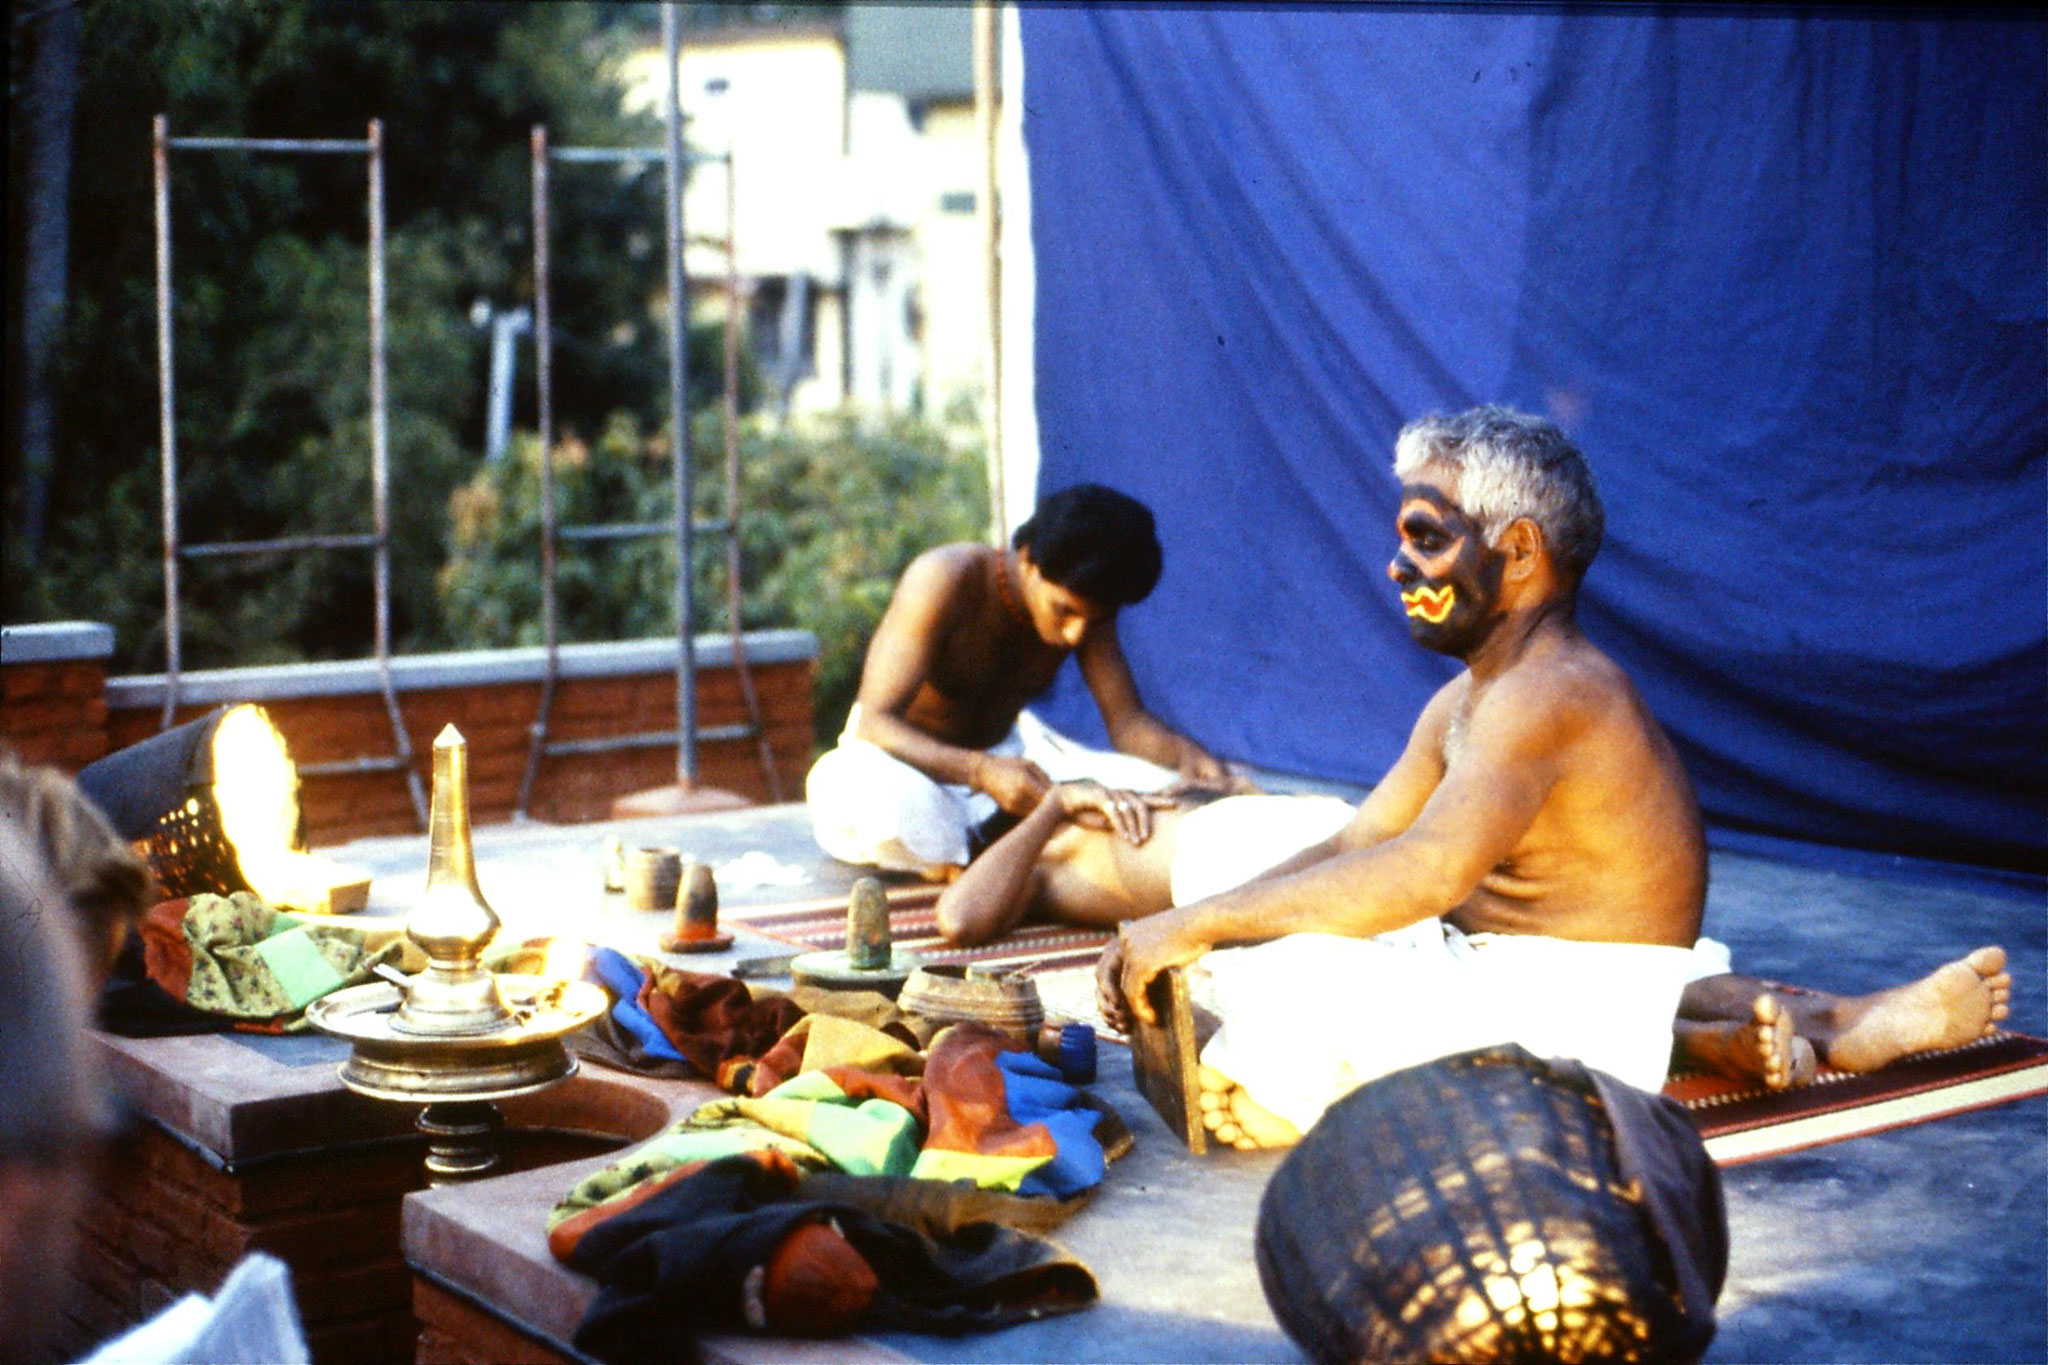 106/17: 24/2/1990 Erkunaculum - See India Foundation - Make up - Kathakali Dance